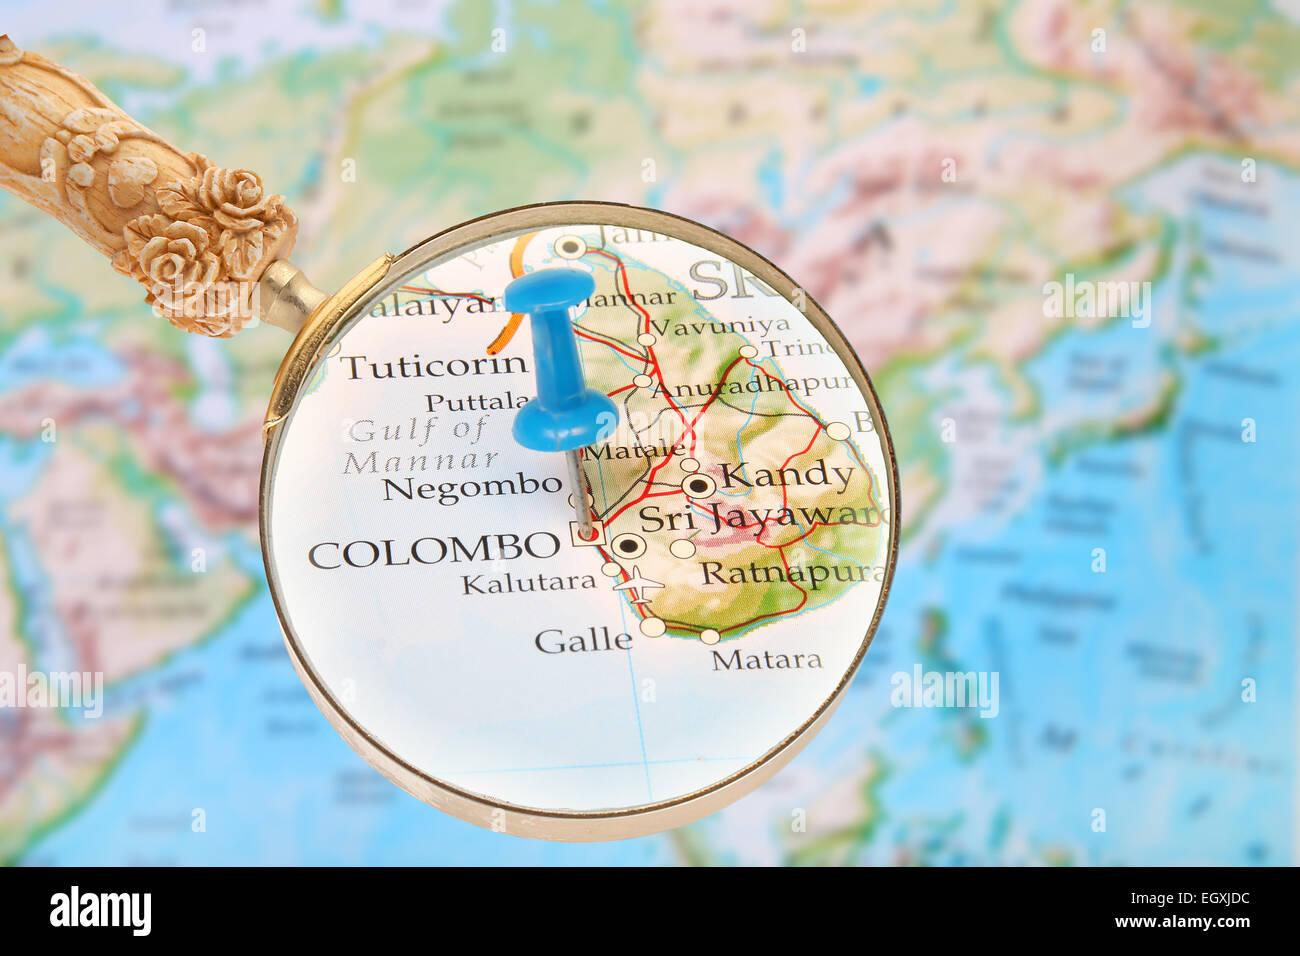 Hauptstadt Von Sri Lanka Wo Liegt Sri Lanka Tourismus